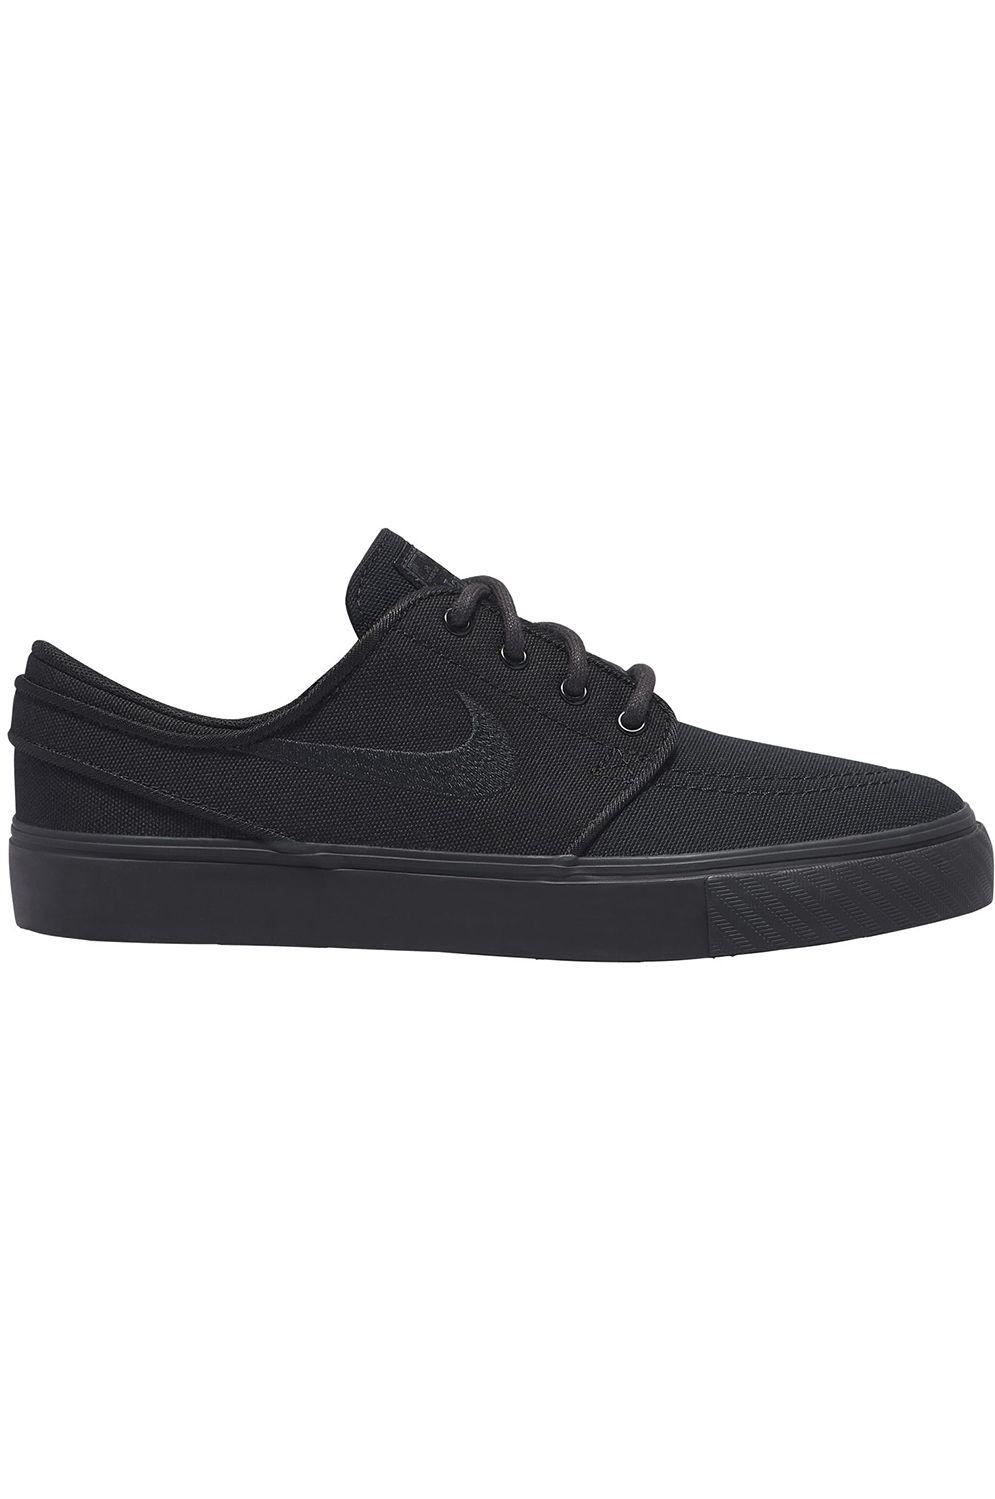 Nike Sb Shoes STEFAN JANOSKI Black/Black-Anthracite